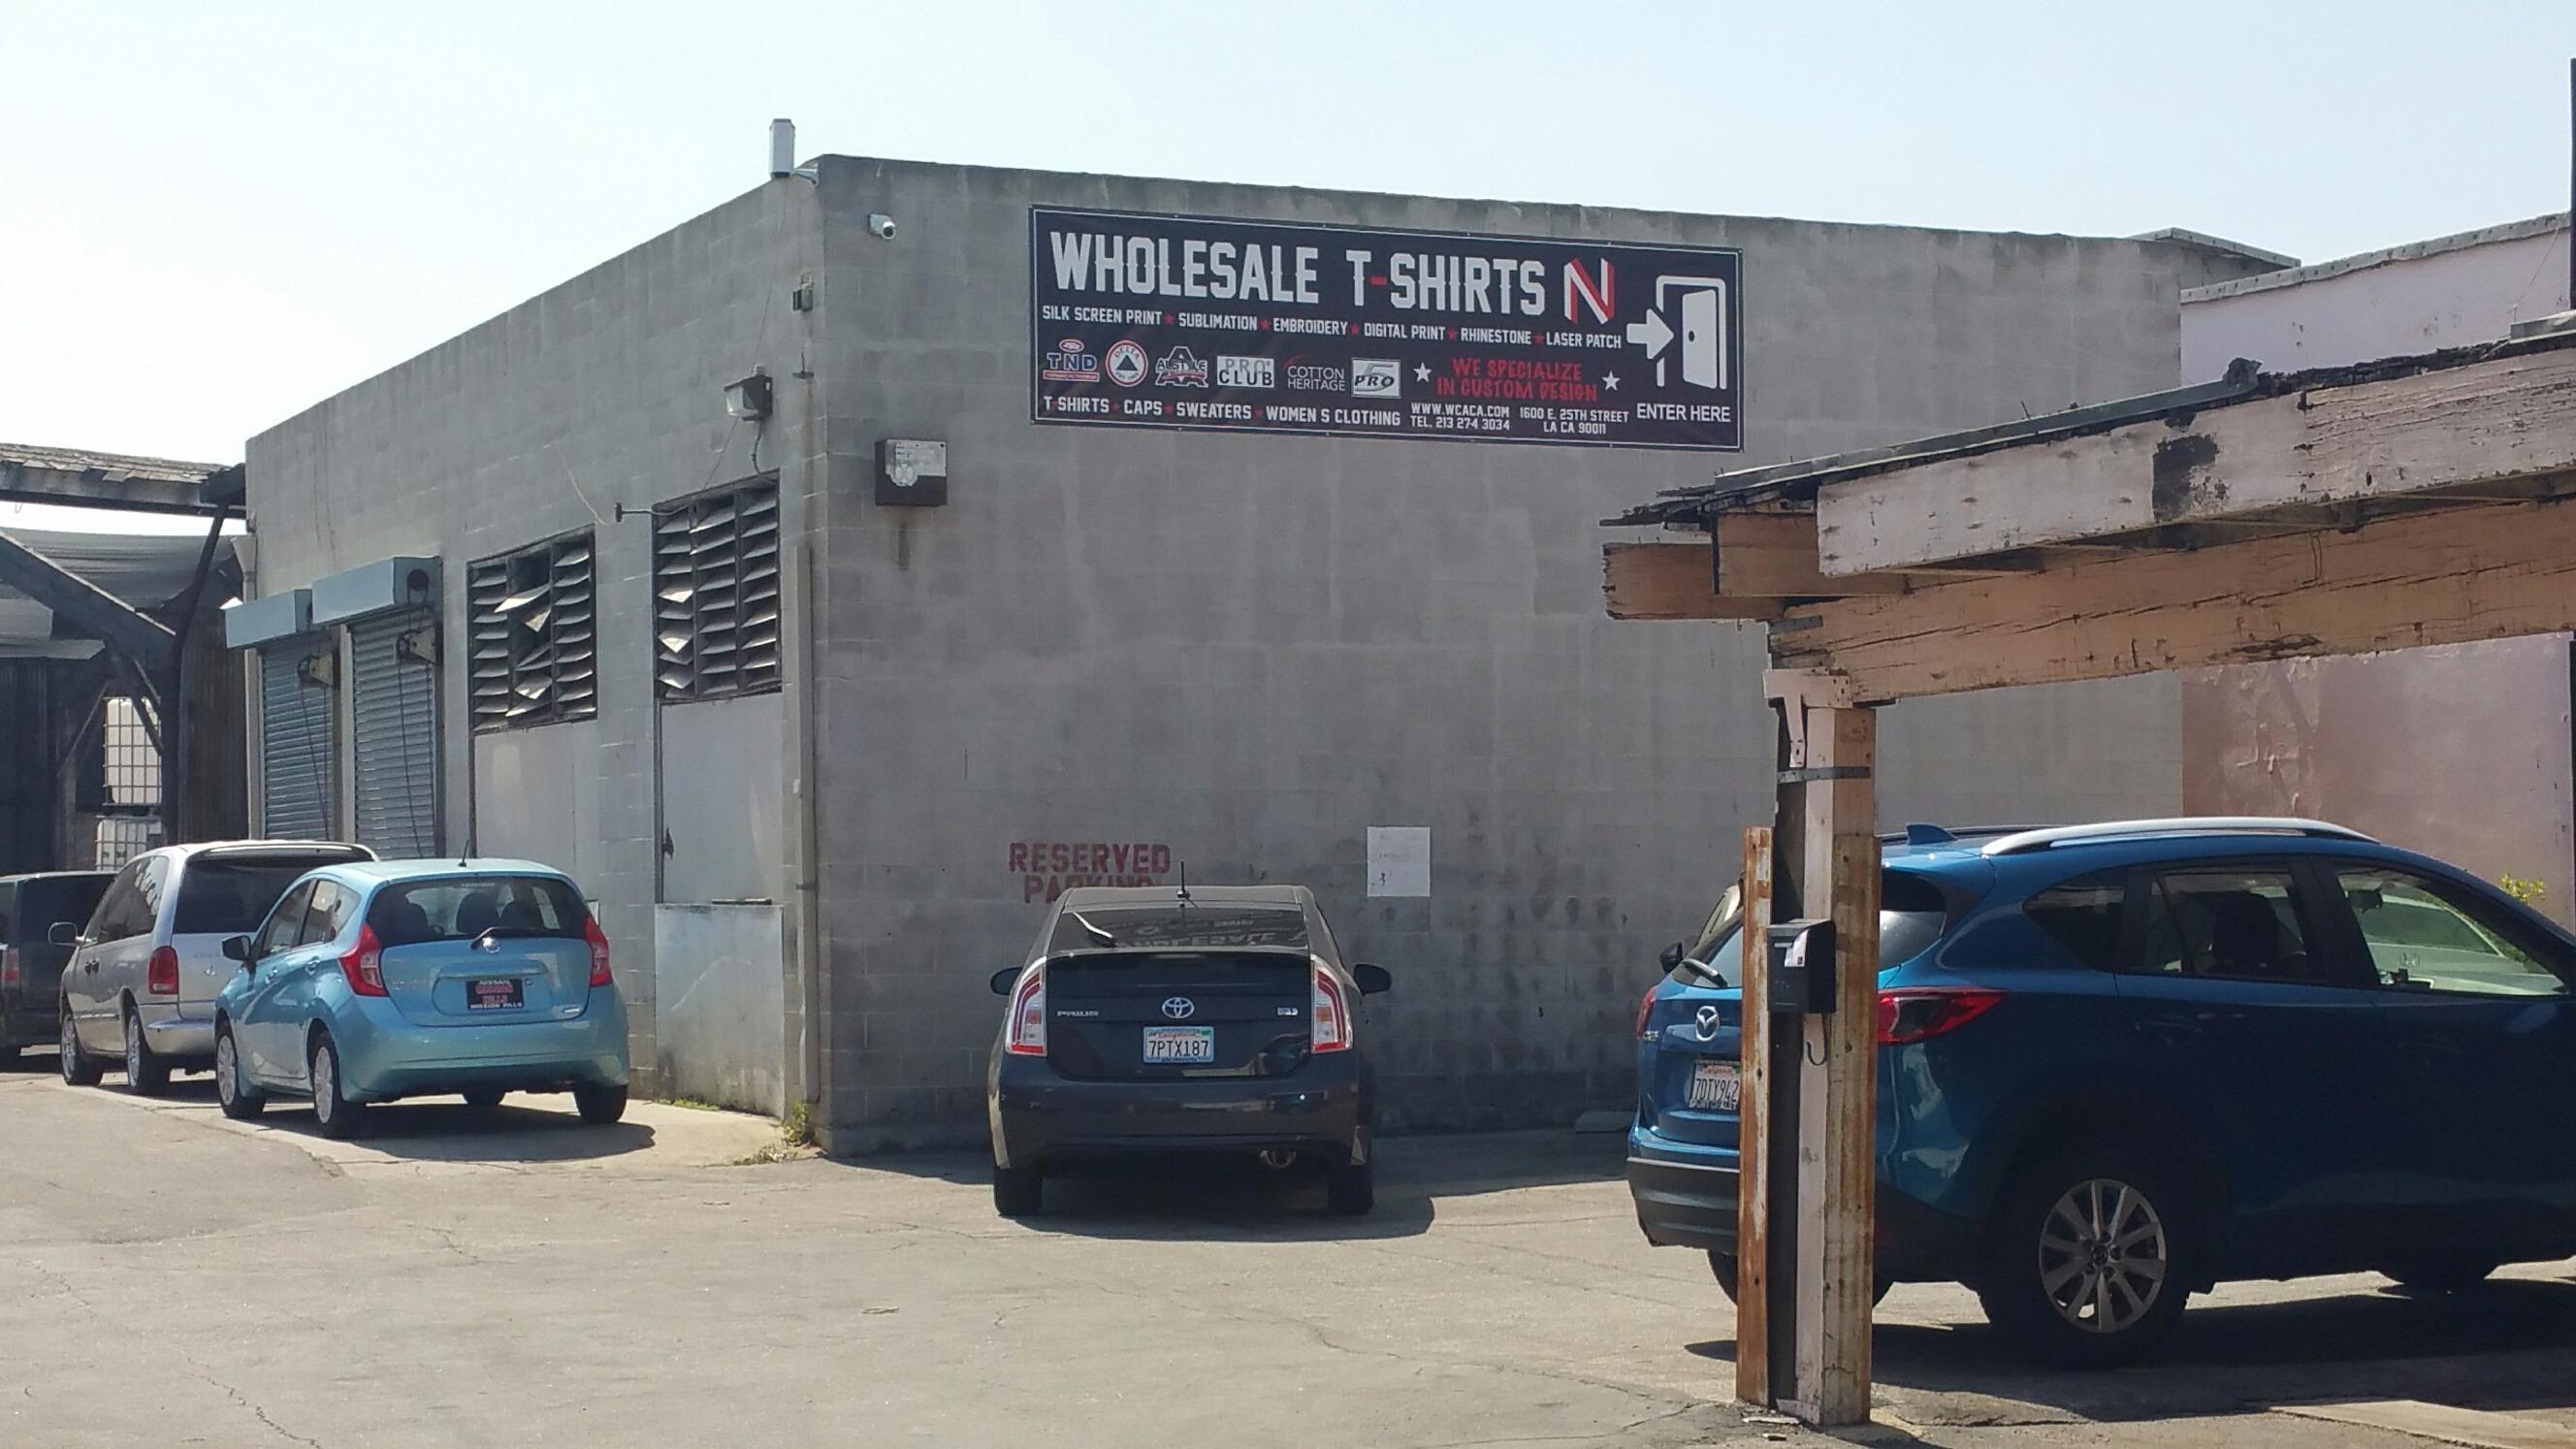 wholesale t shirts N image 21